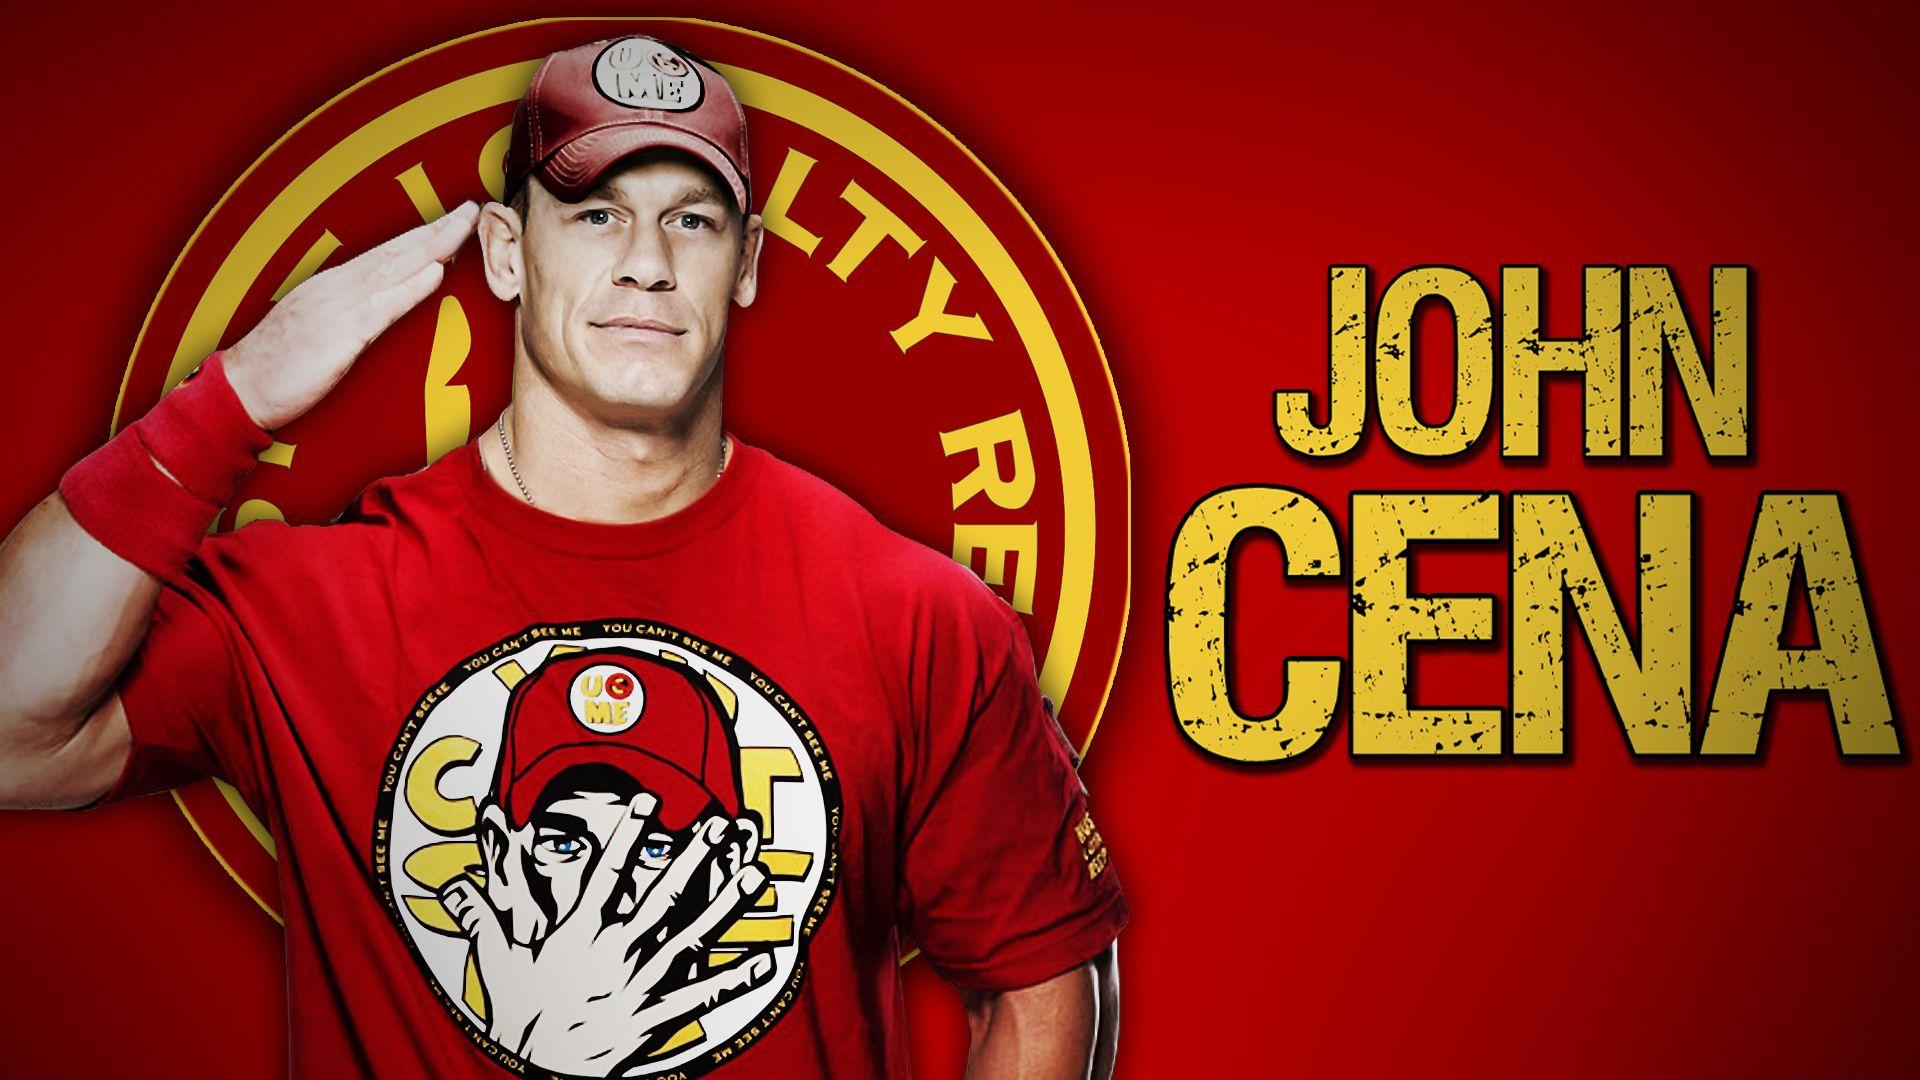 John Cena HD Wallpaper And Images 2015 6   Hd Wallpapers 2015 1920x1080